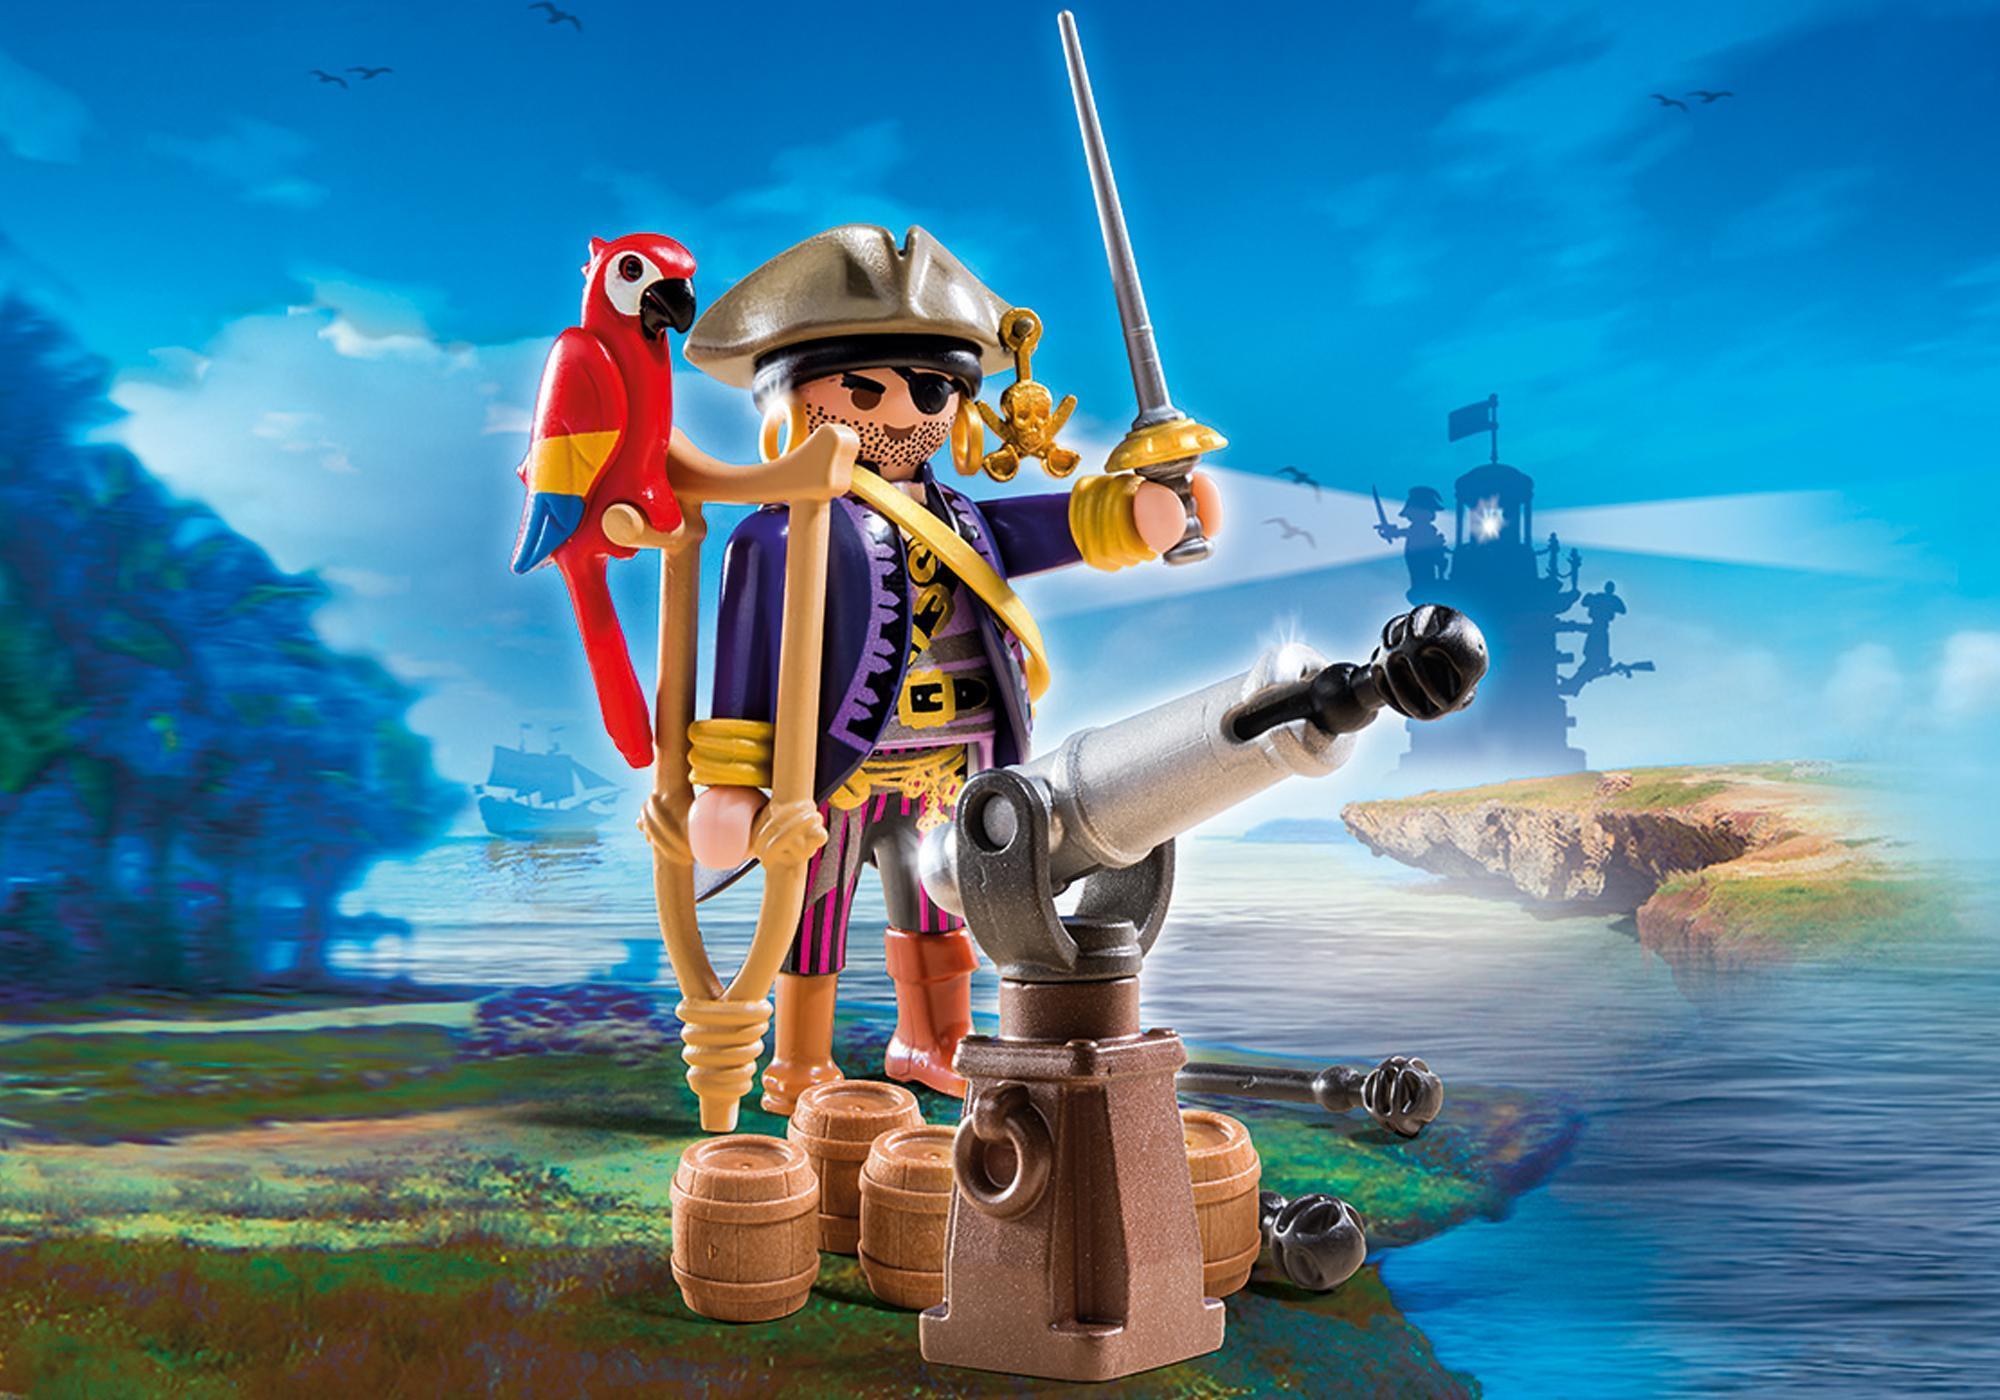 http://media.playmobil.com/i/playmobil/6684_product_detail/Kapitan piratów